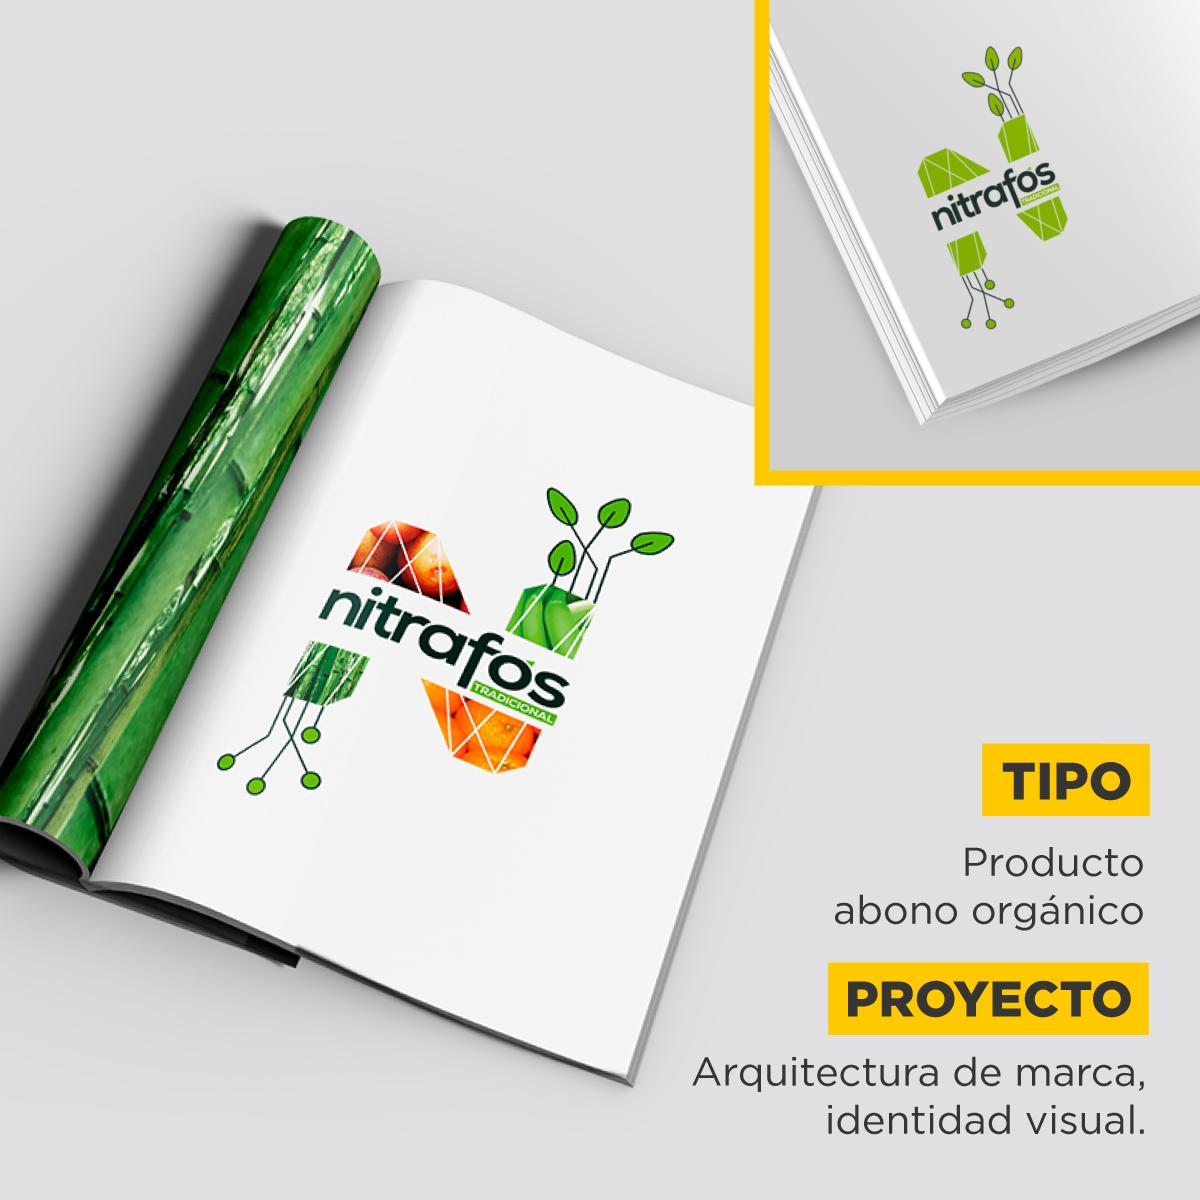 imagen+agro1.png